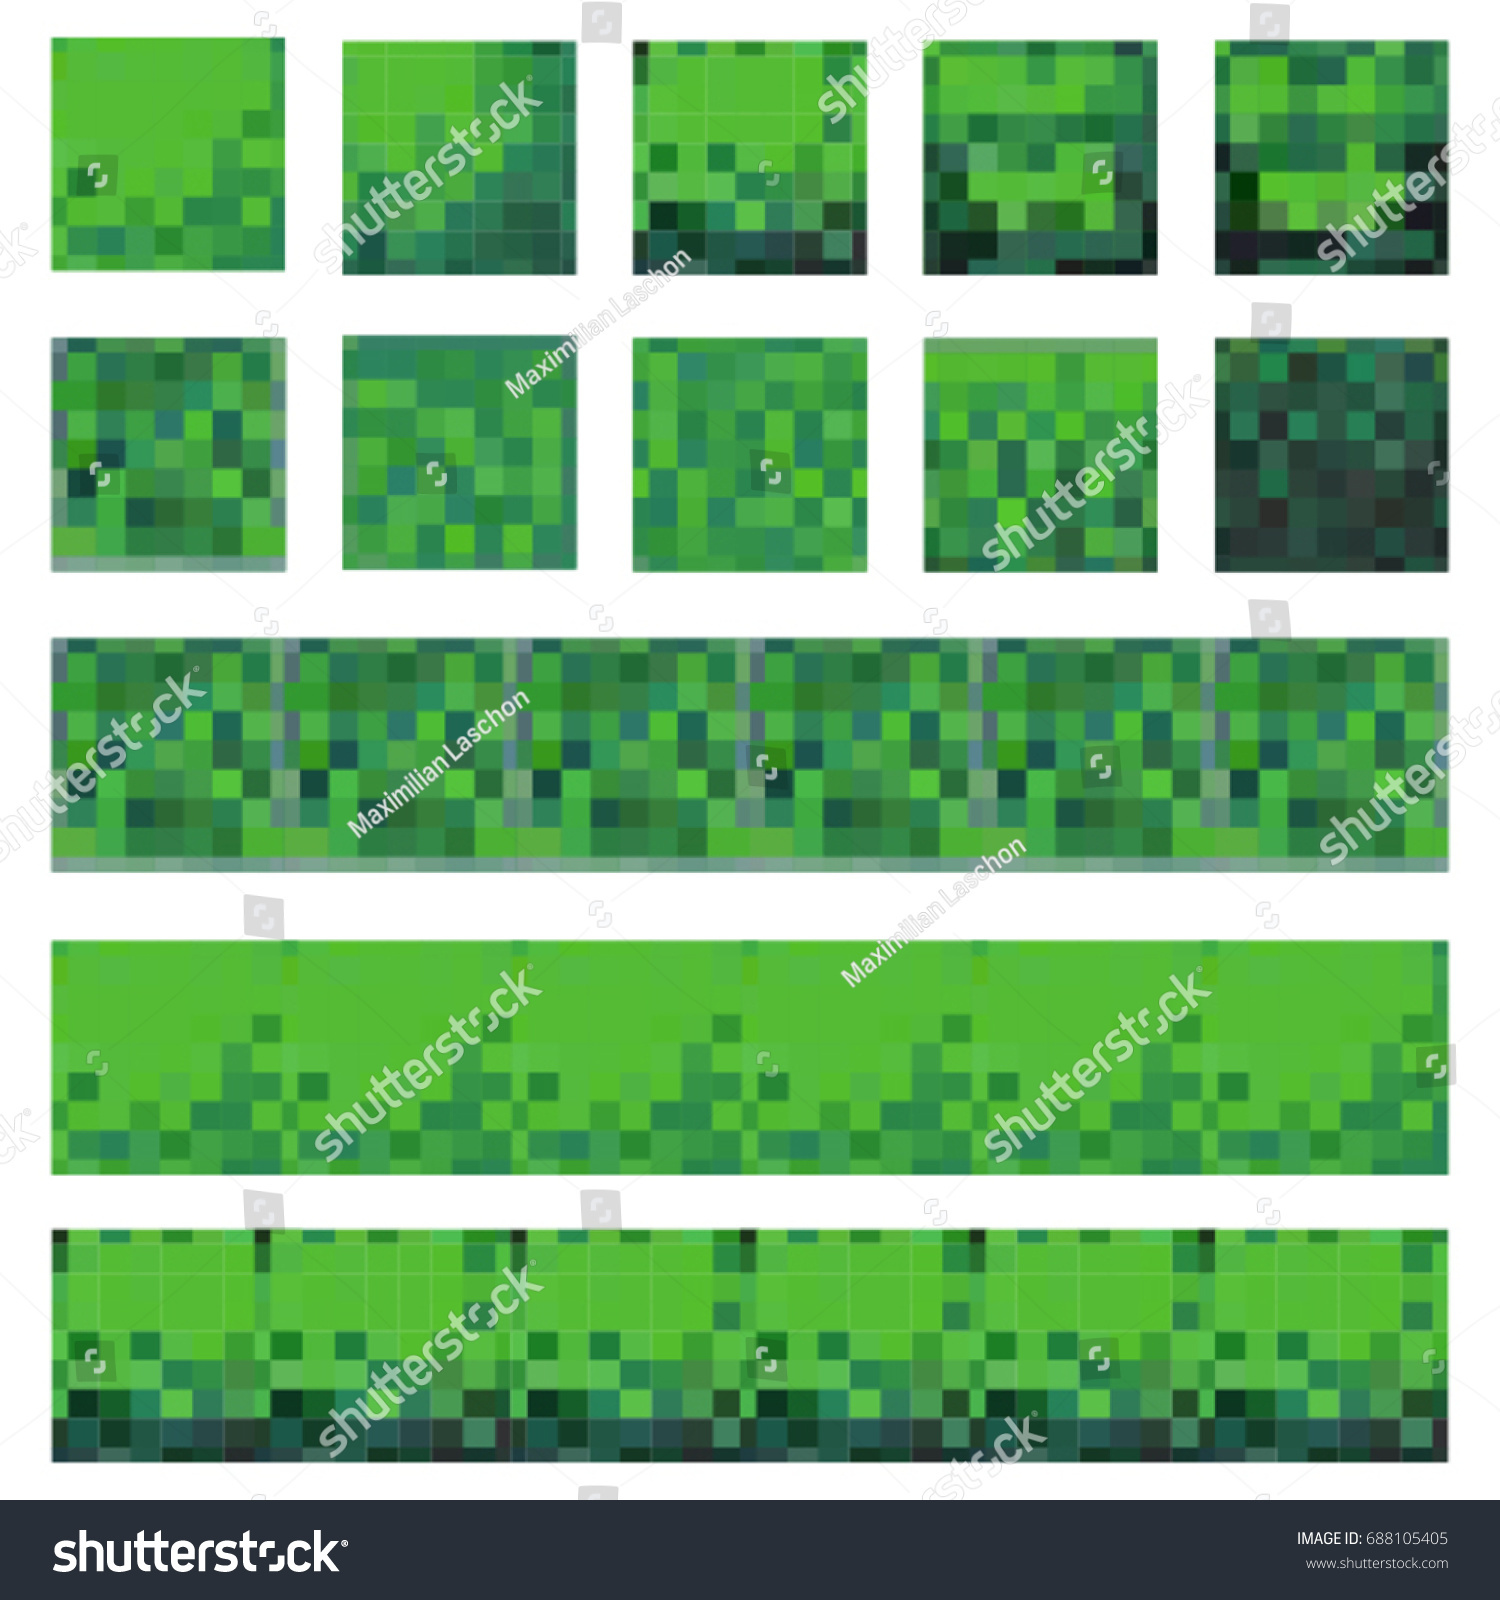 8bit Retro Pixel Art Texture Pack Stock Vector (Royalty Free